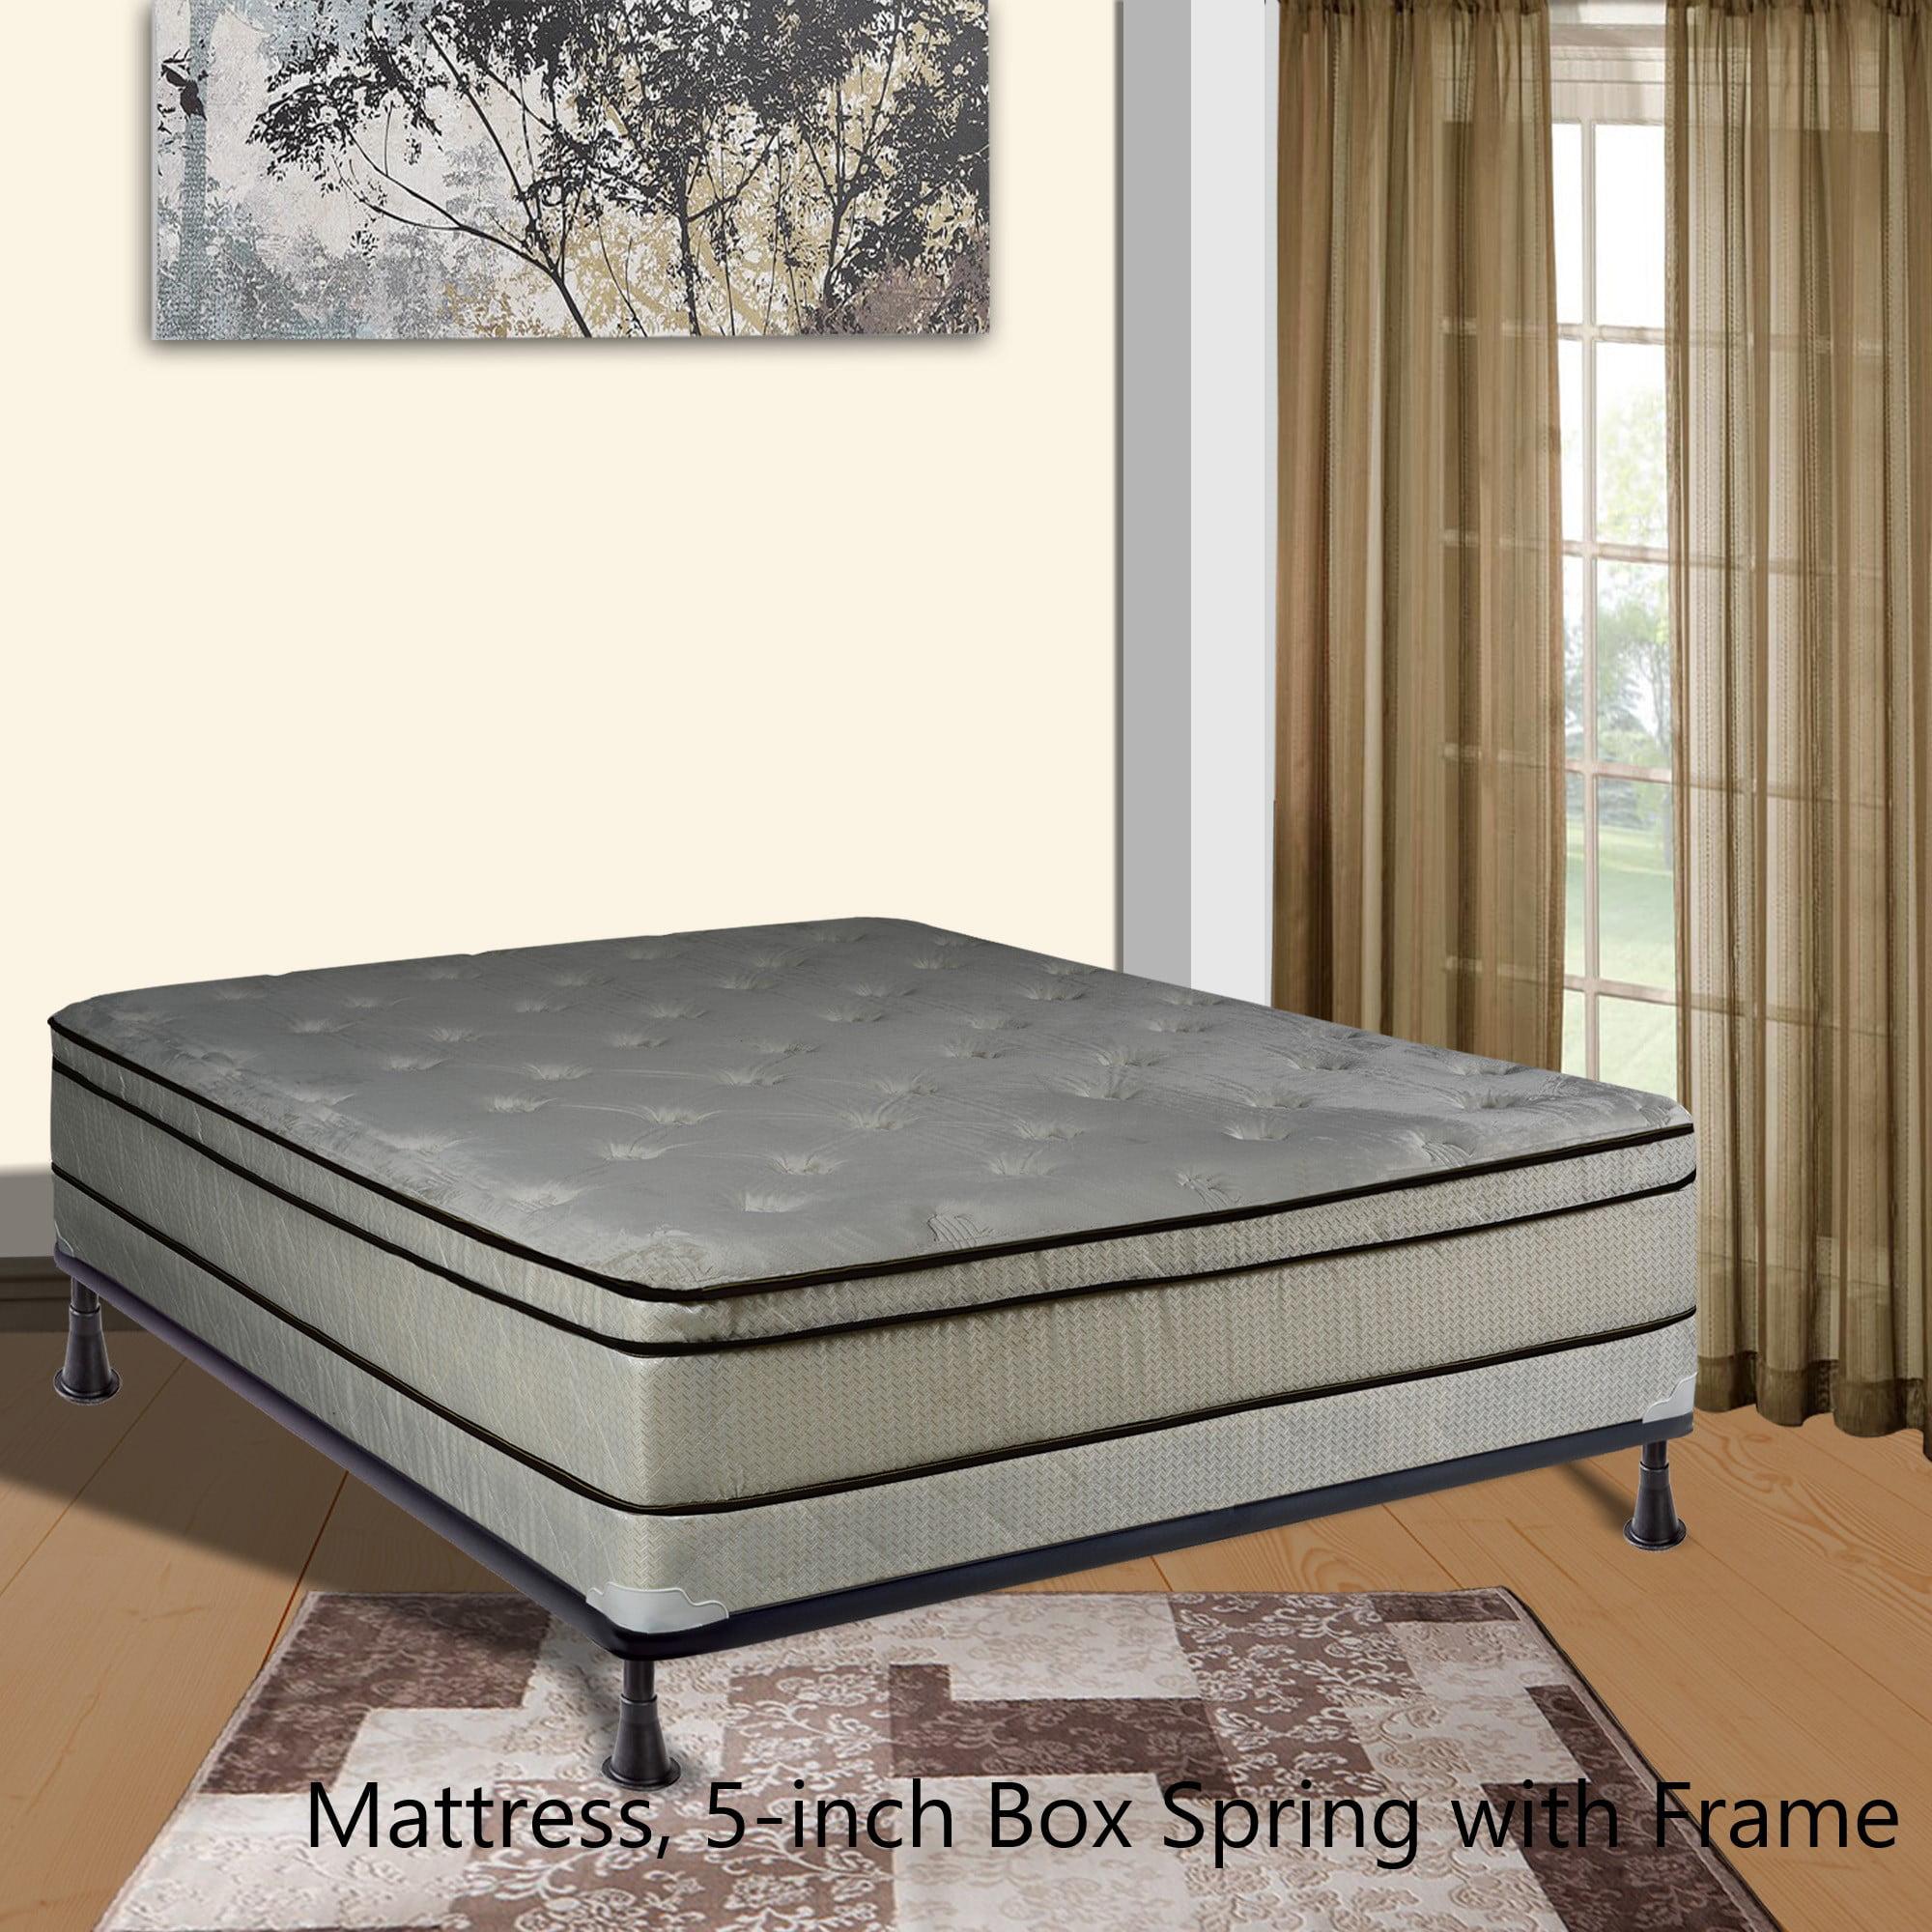 "Continental Sleep, 11-inch Fully Assembled FOAM ENCASED Innerspring Heavy plush Teddy Bear Fabric Mattress and 4"" Semi Flex Box Spring with Frame, Twin Size"